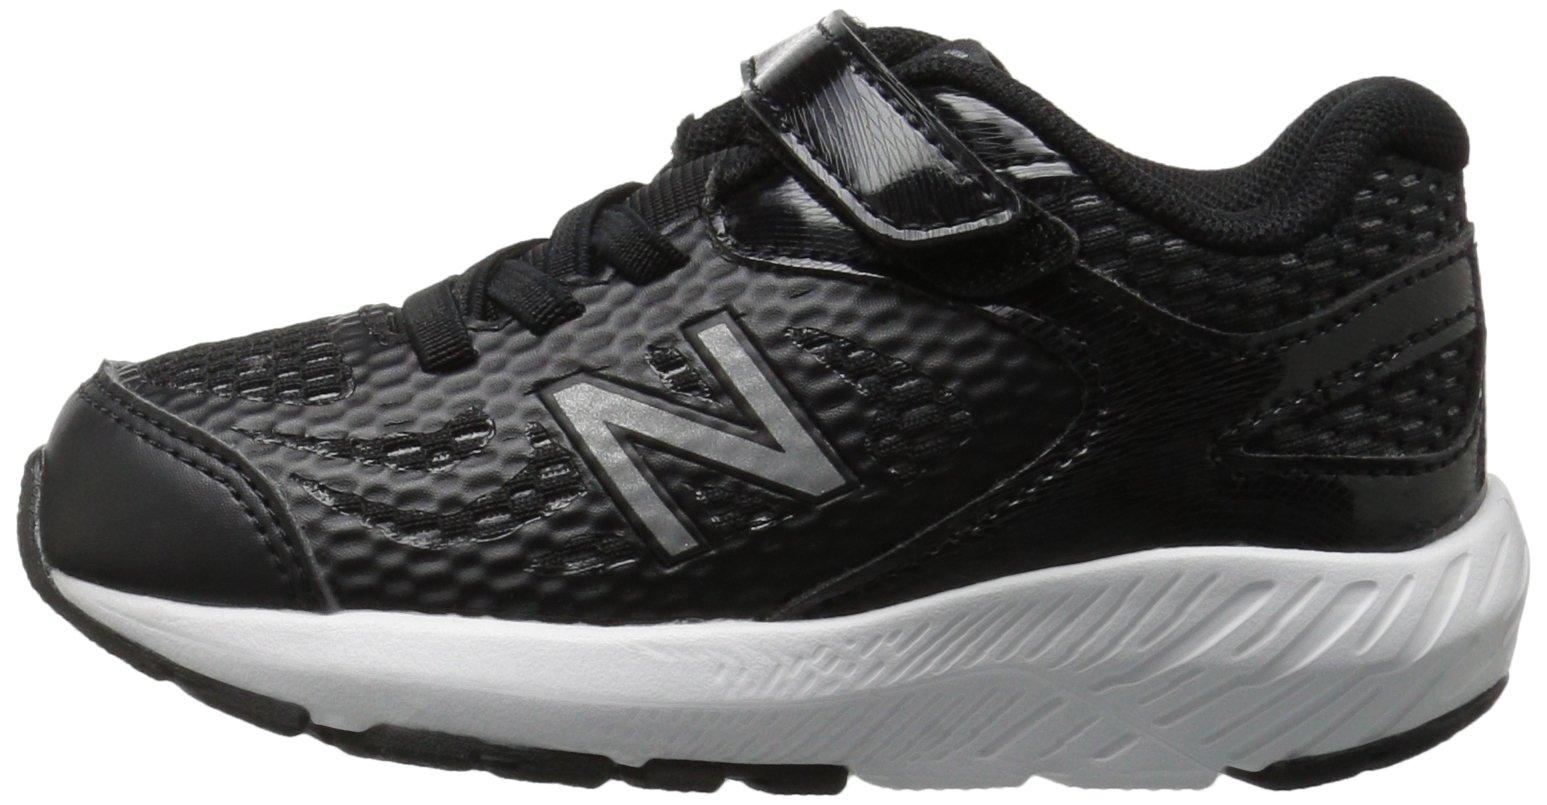 New Balance Boys' 519v1 Hook and Loop Running Shoe Black/White 2 M US Infant by New Balance (Image #5)